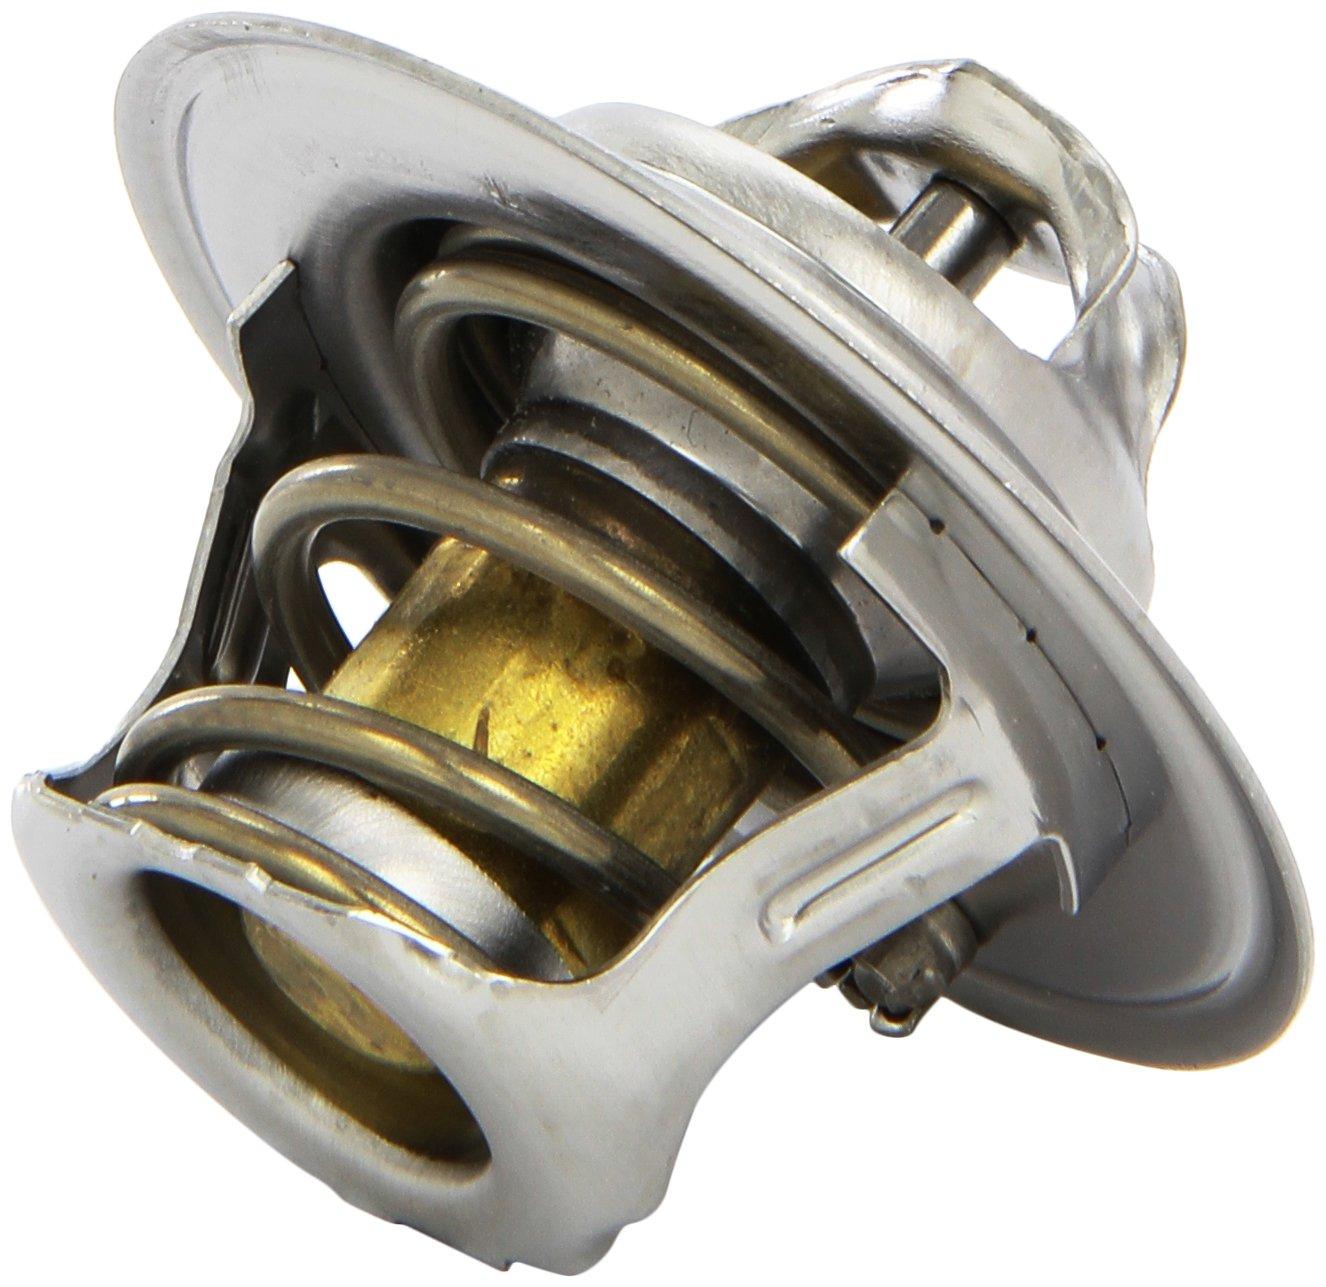 Behr Thermot-Tronik TX 4 87D - Termostato, Refrigerante Behr-Thermot-Tronik